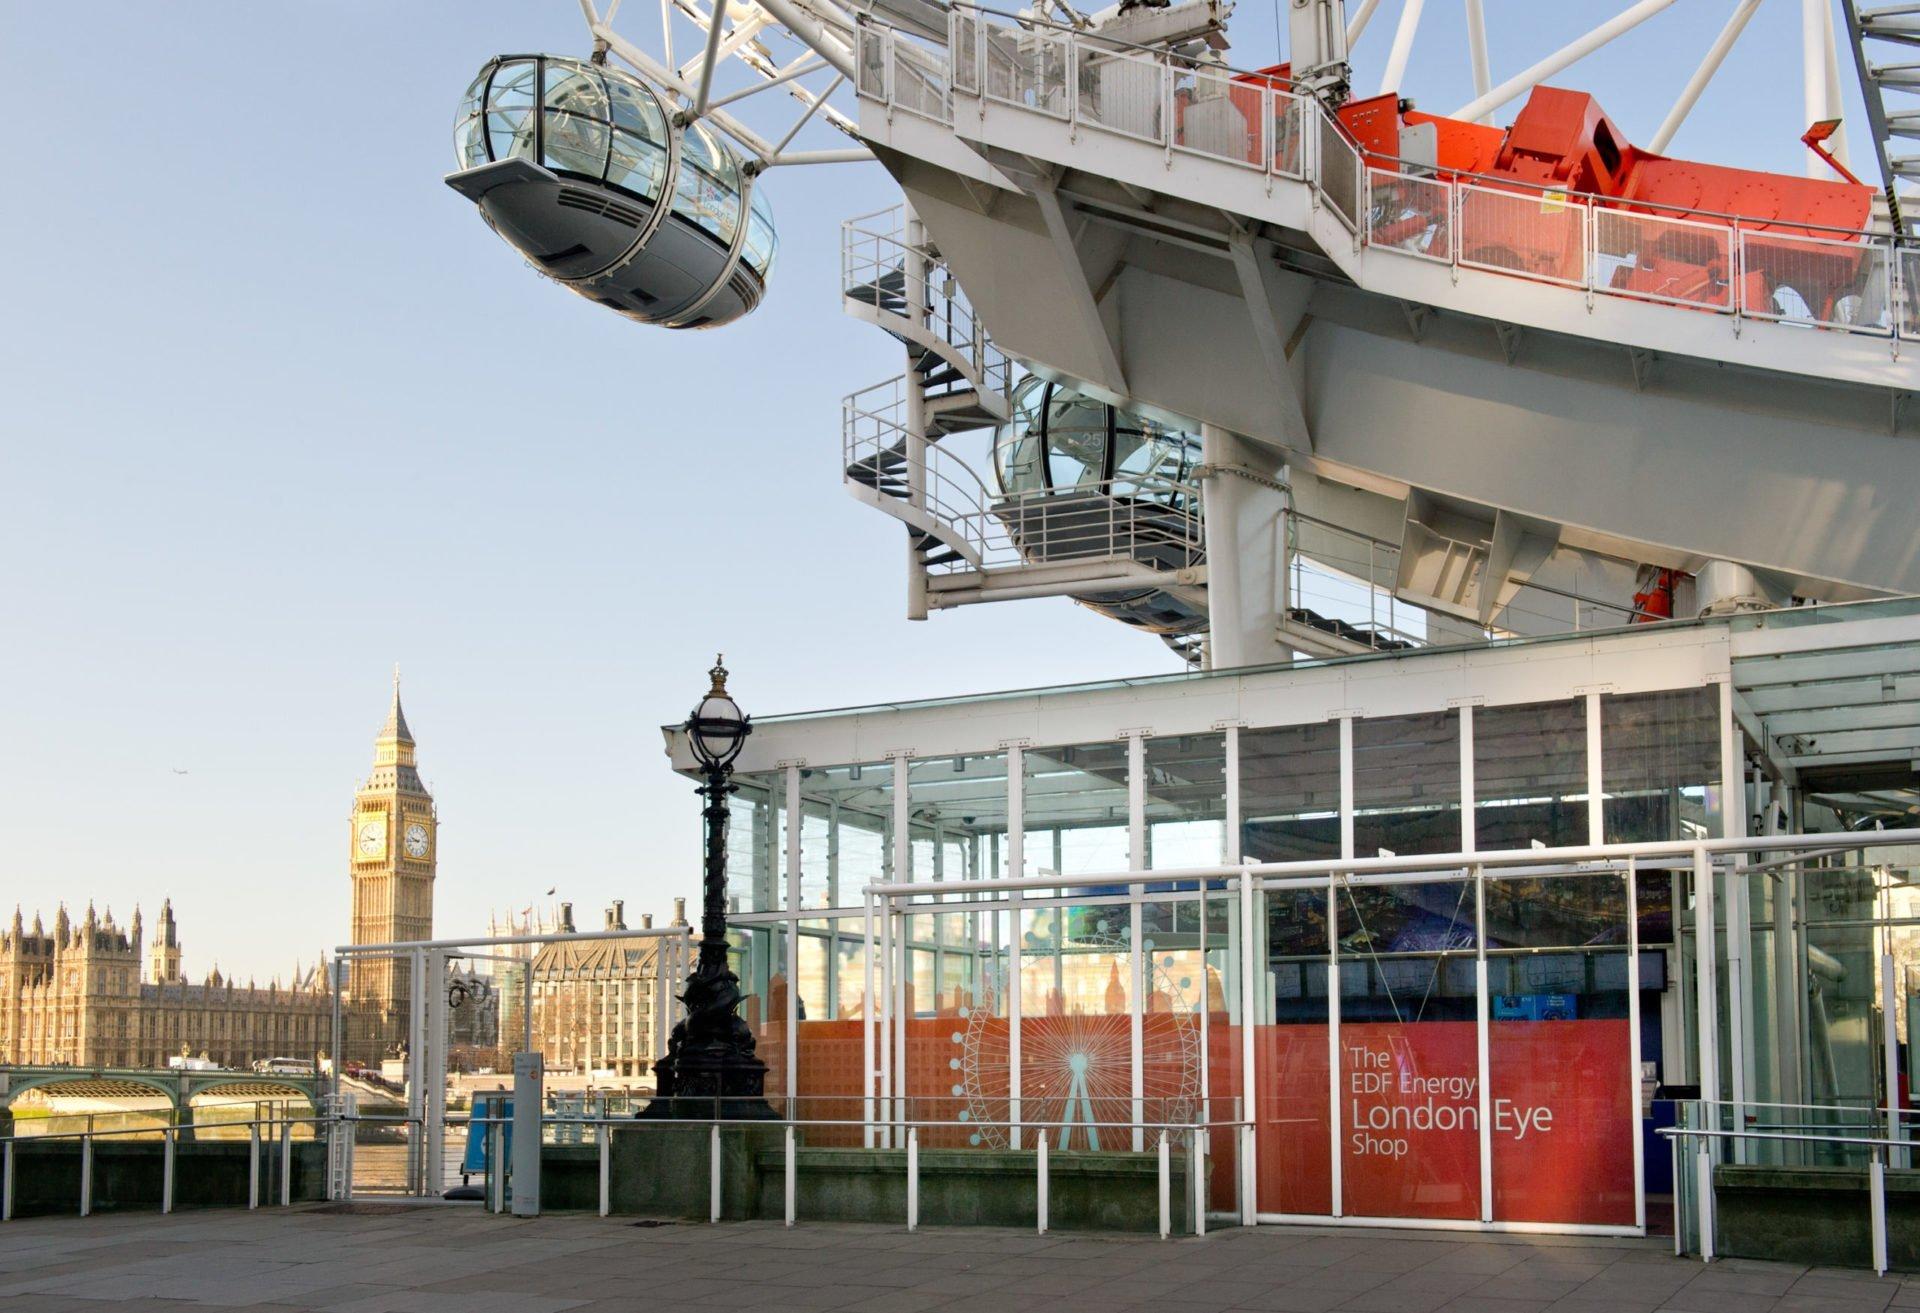 london-eye-lower-panel-see-through-window-graphics